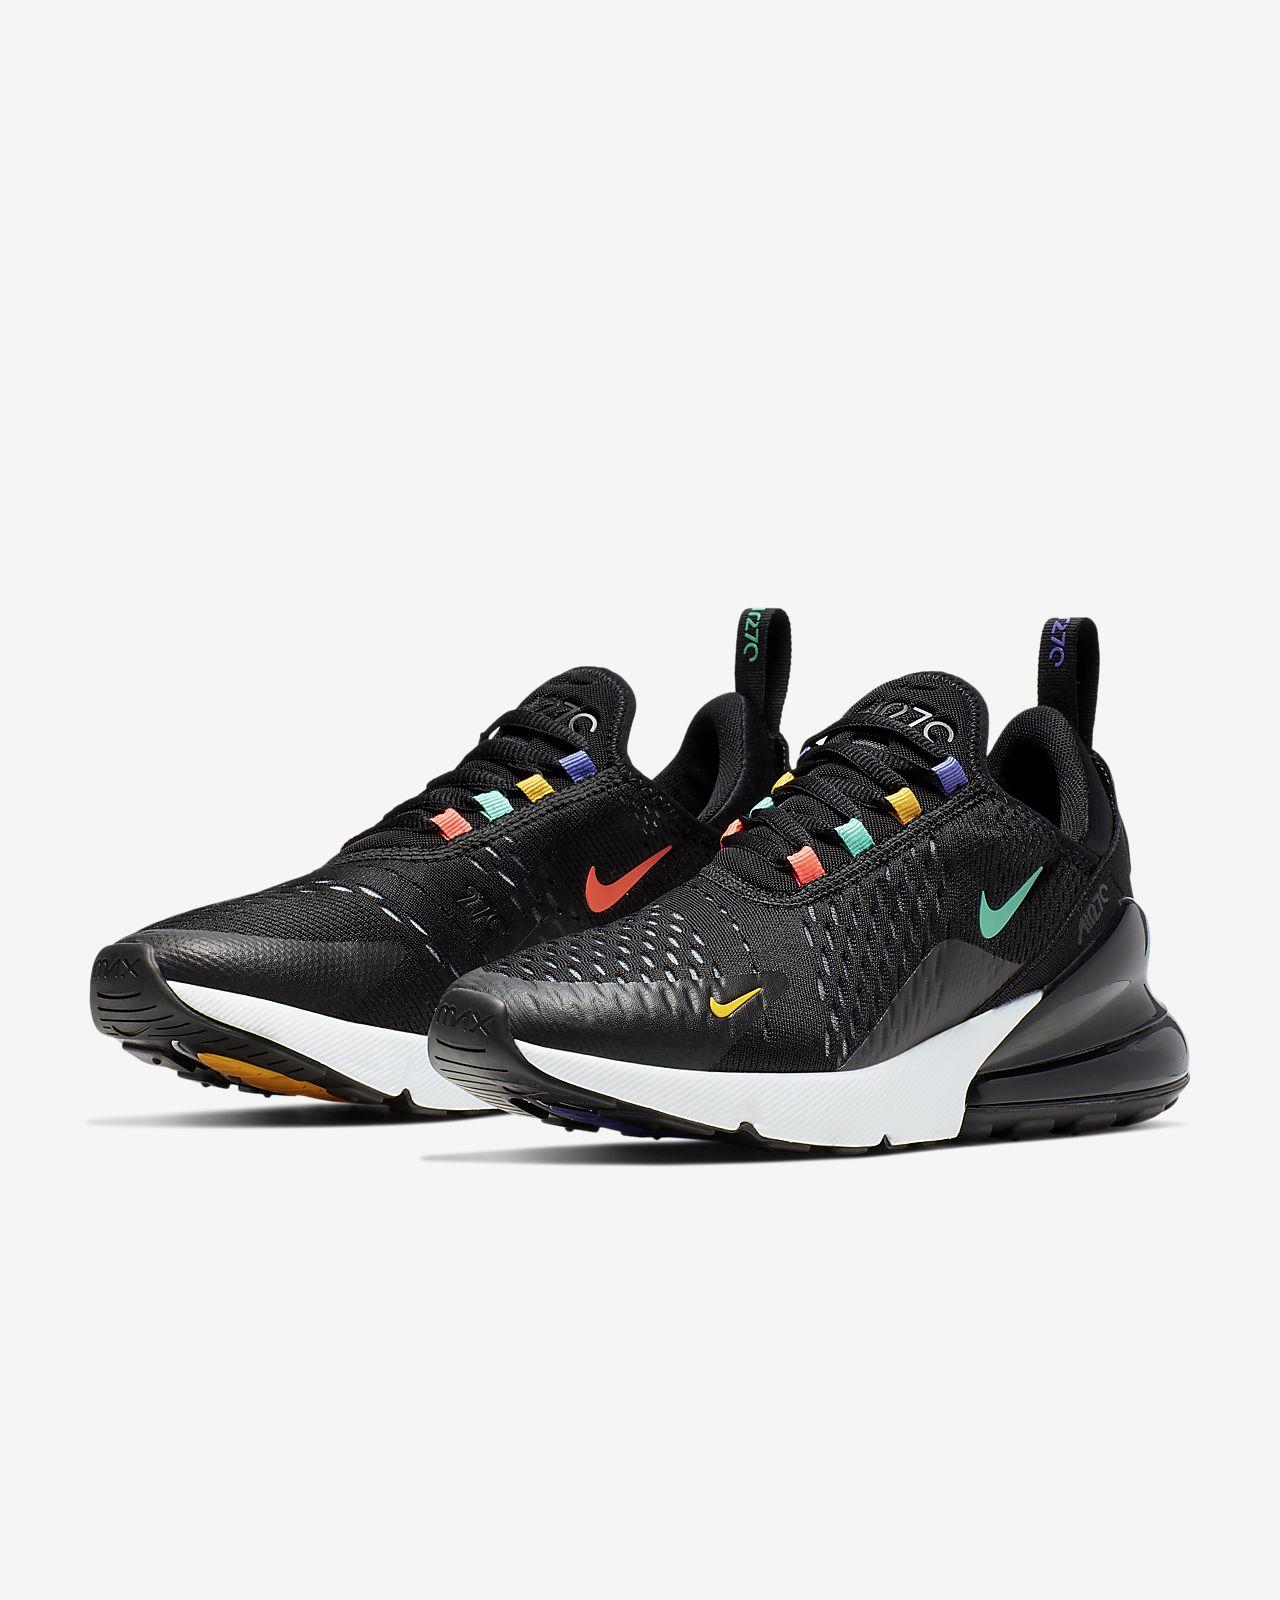 d826b83535d6b Nike Air Max 270 Women's Shoe. Nike.com